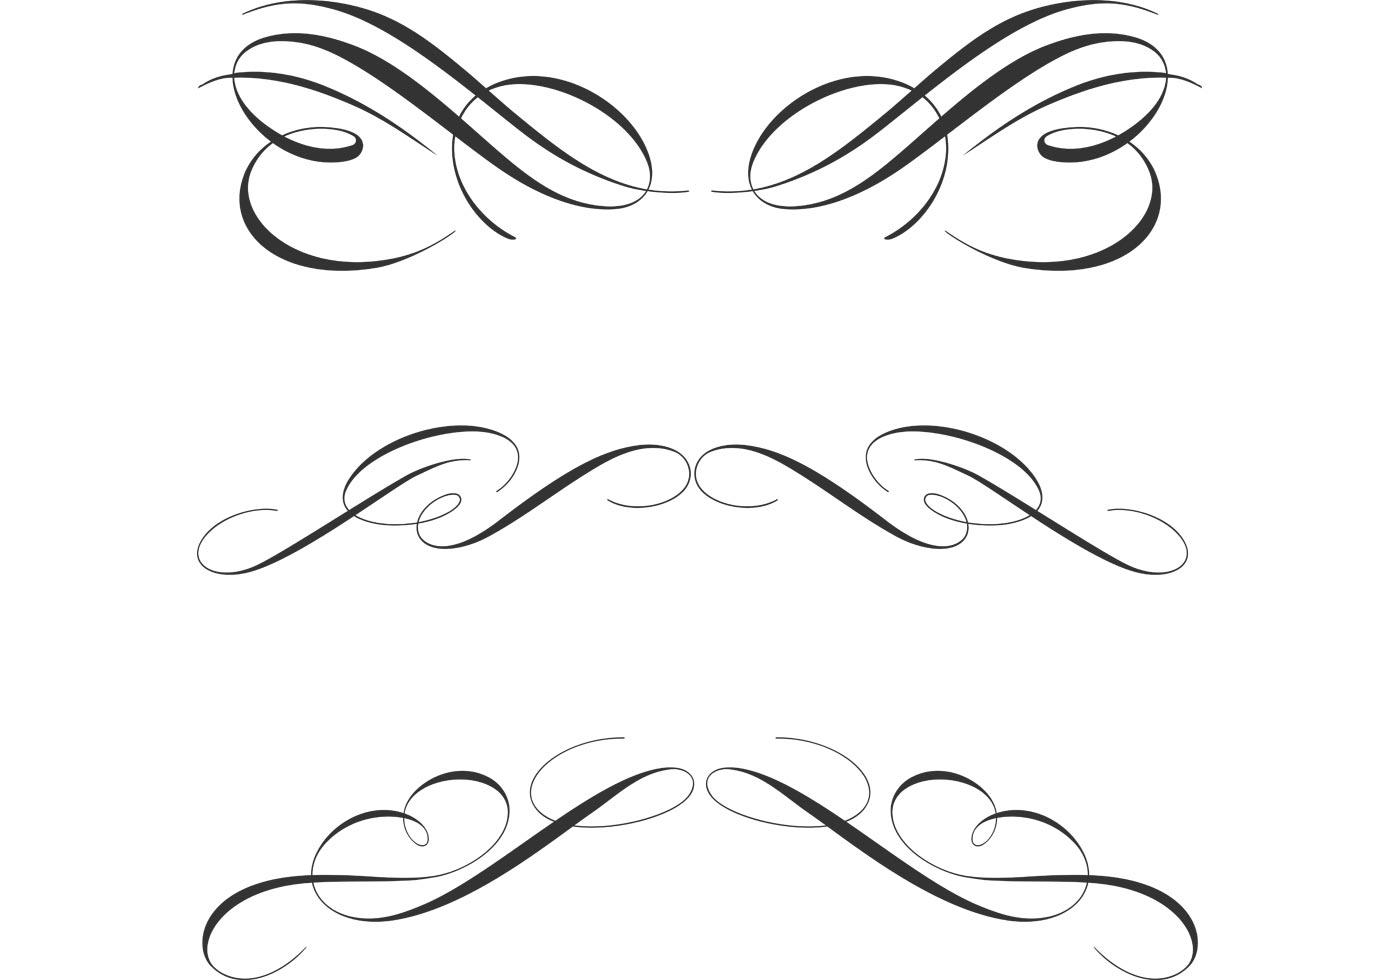 Free Calligraphic Ornament Vectors